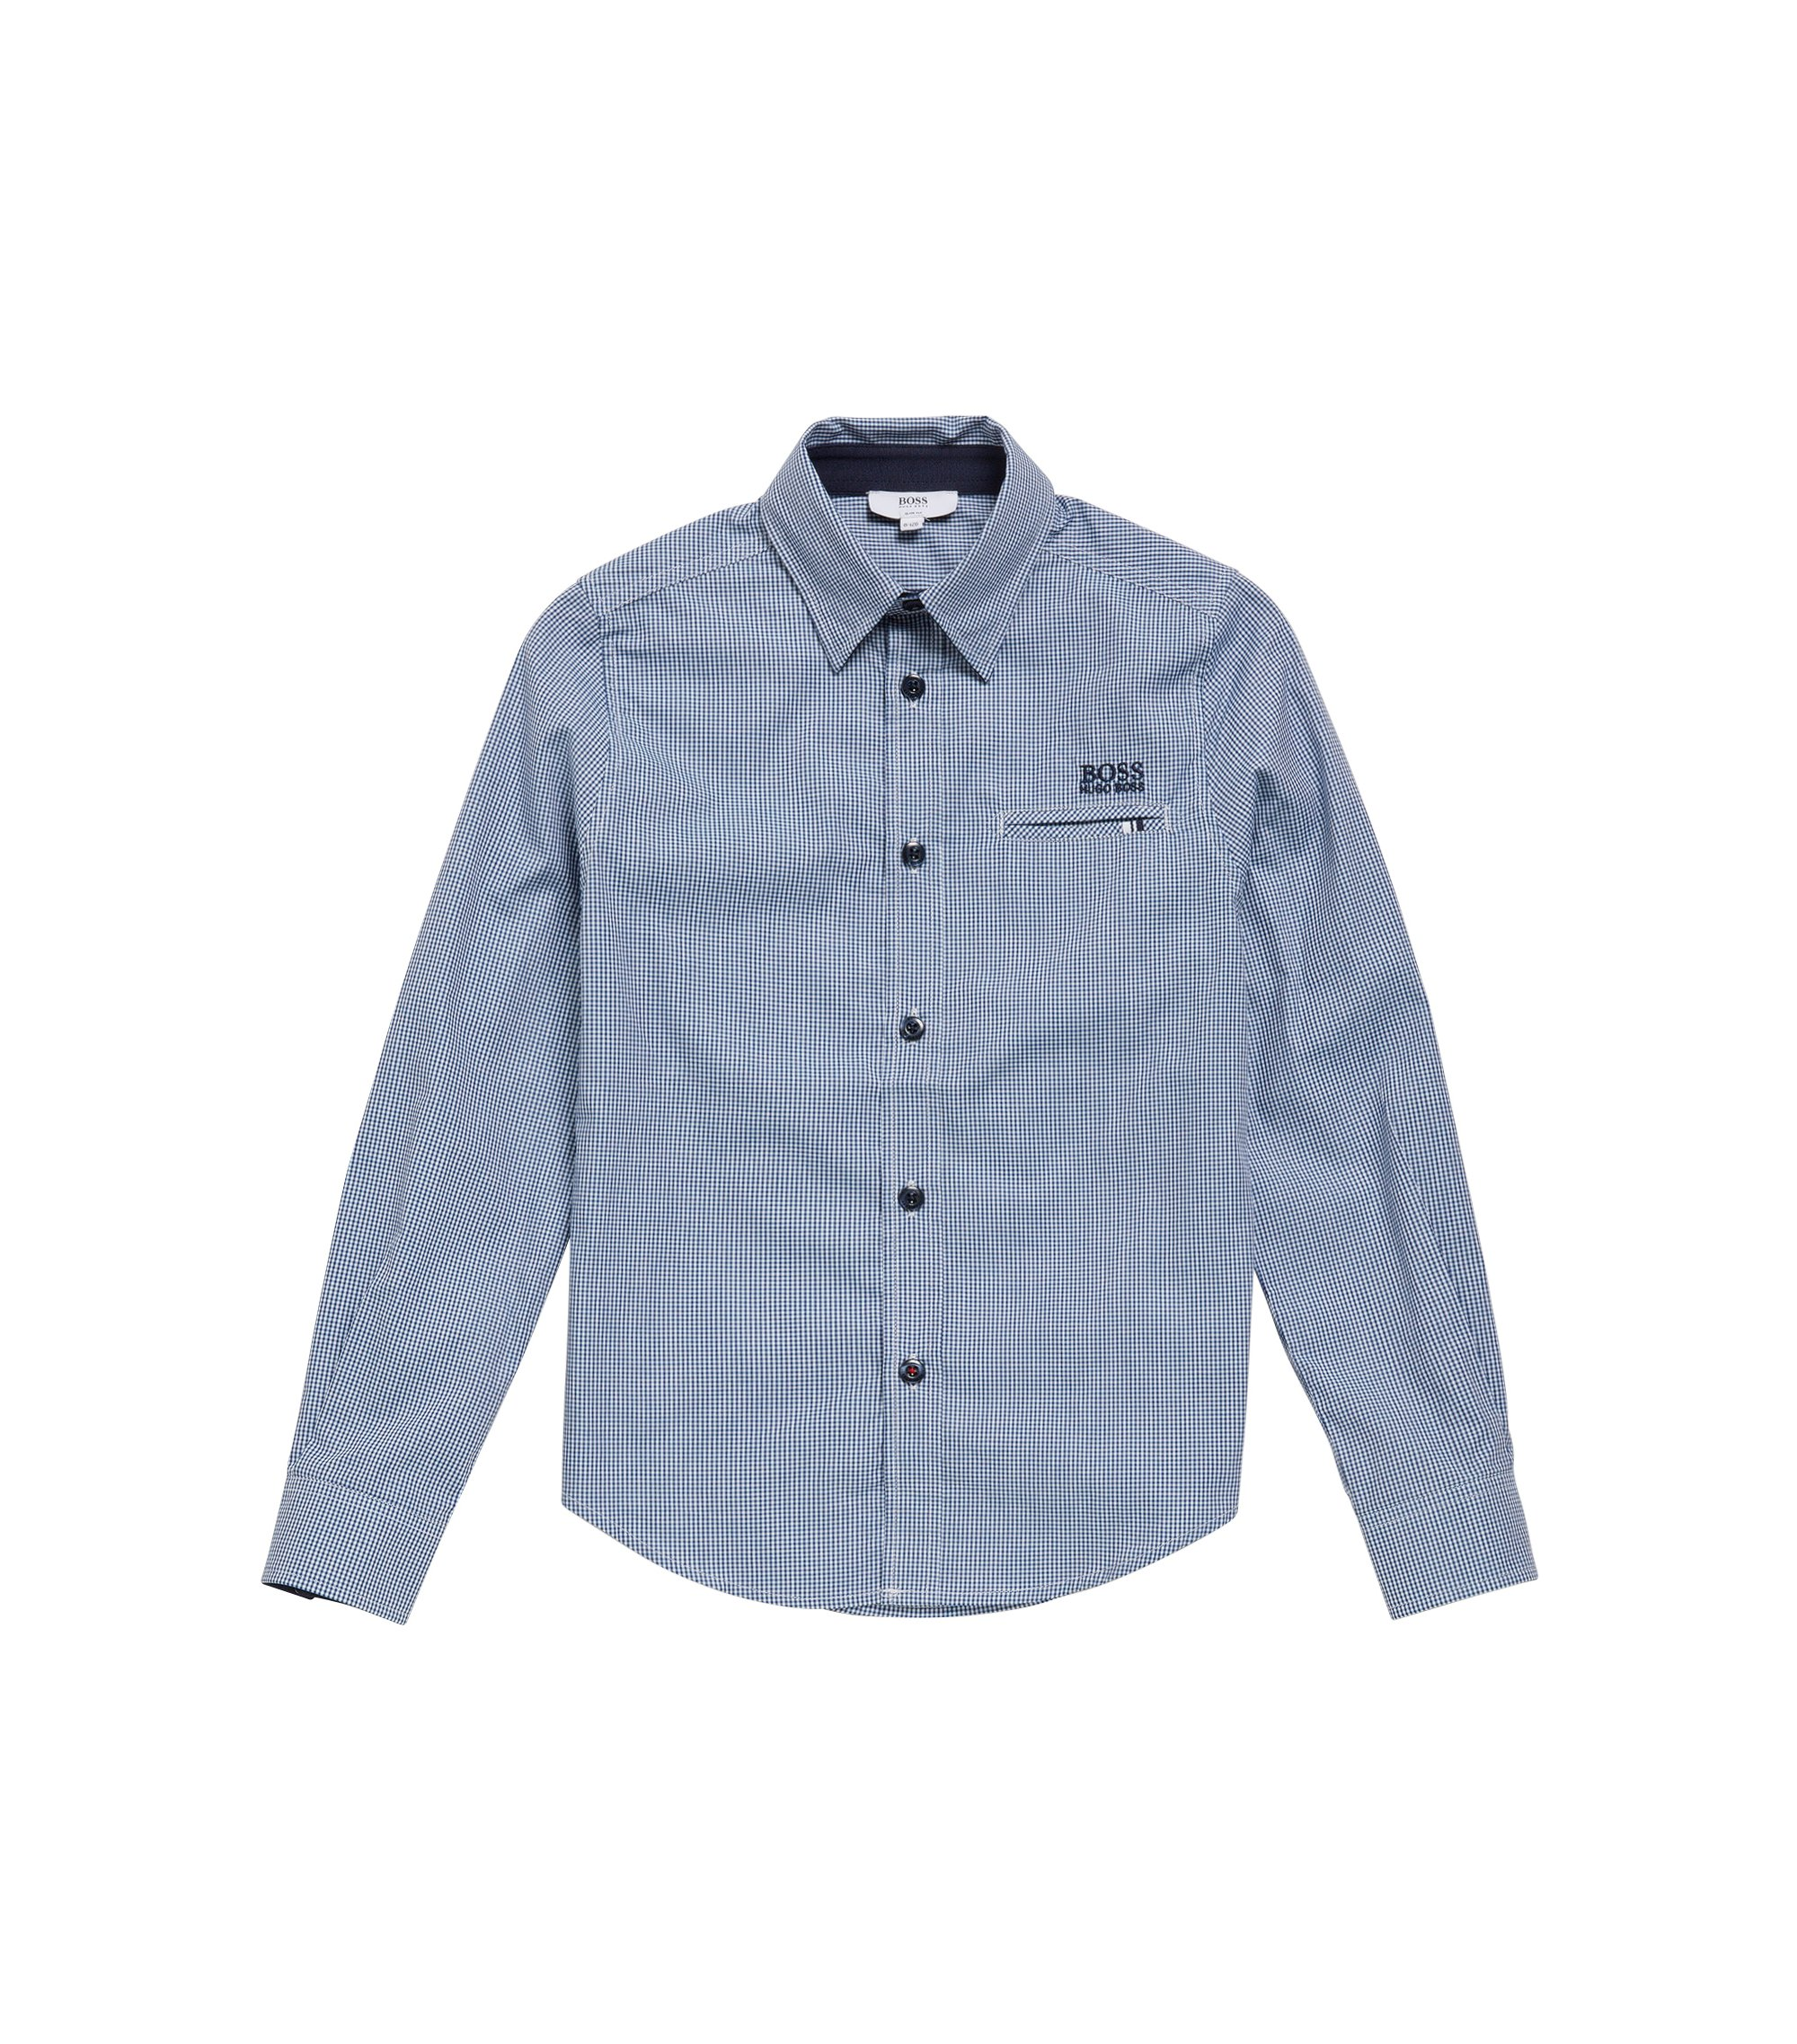 'J25A20' | Boys Cotton Button Down Shirt, Dark Blue